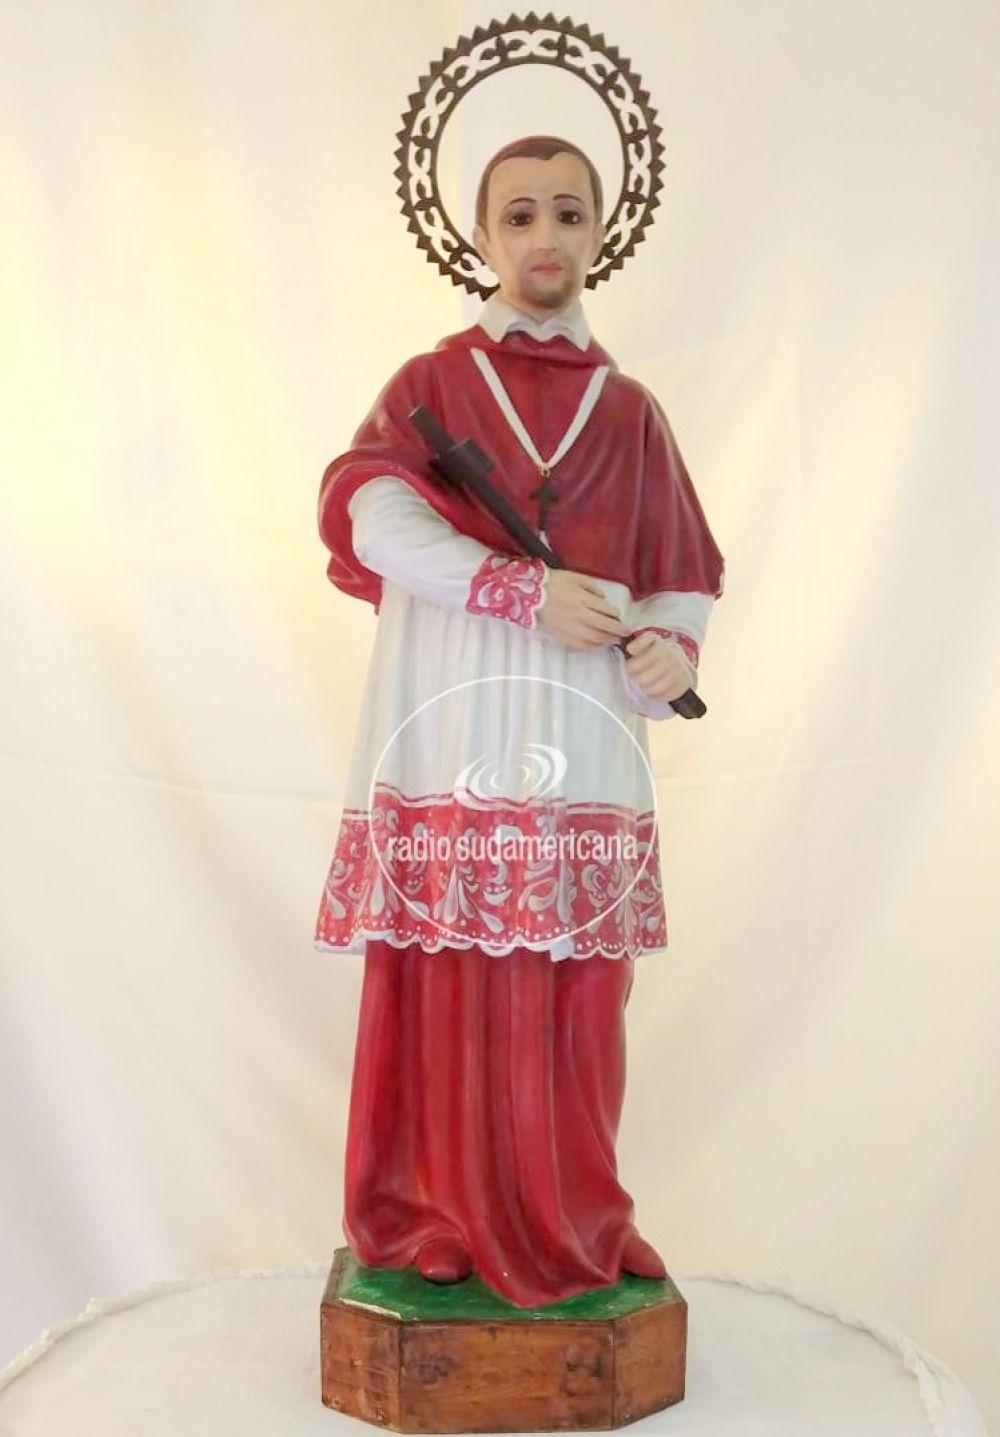 foto: Santoral: La Iglesia católica recuerda a San Carlos Borromeo